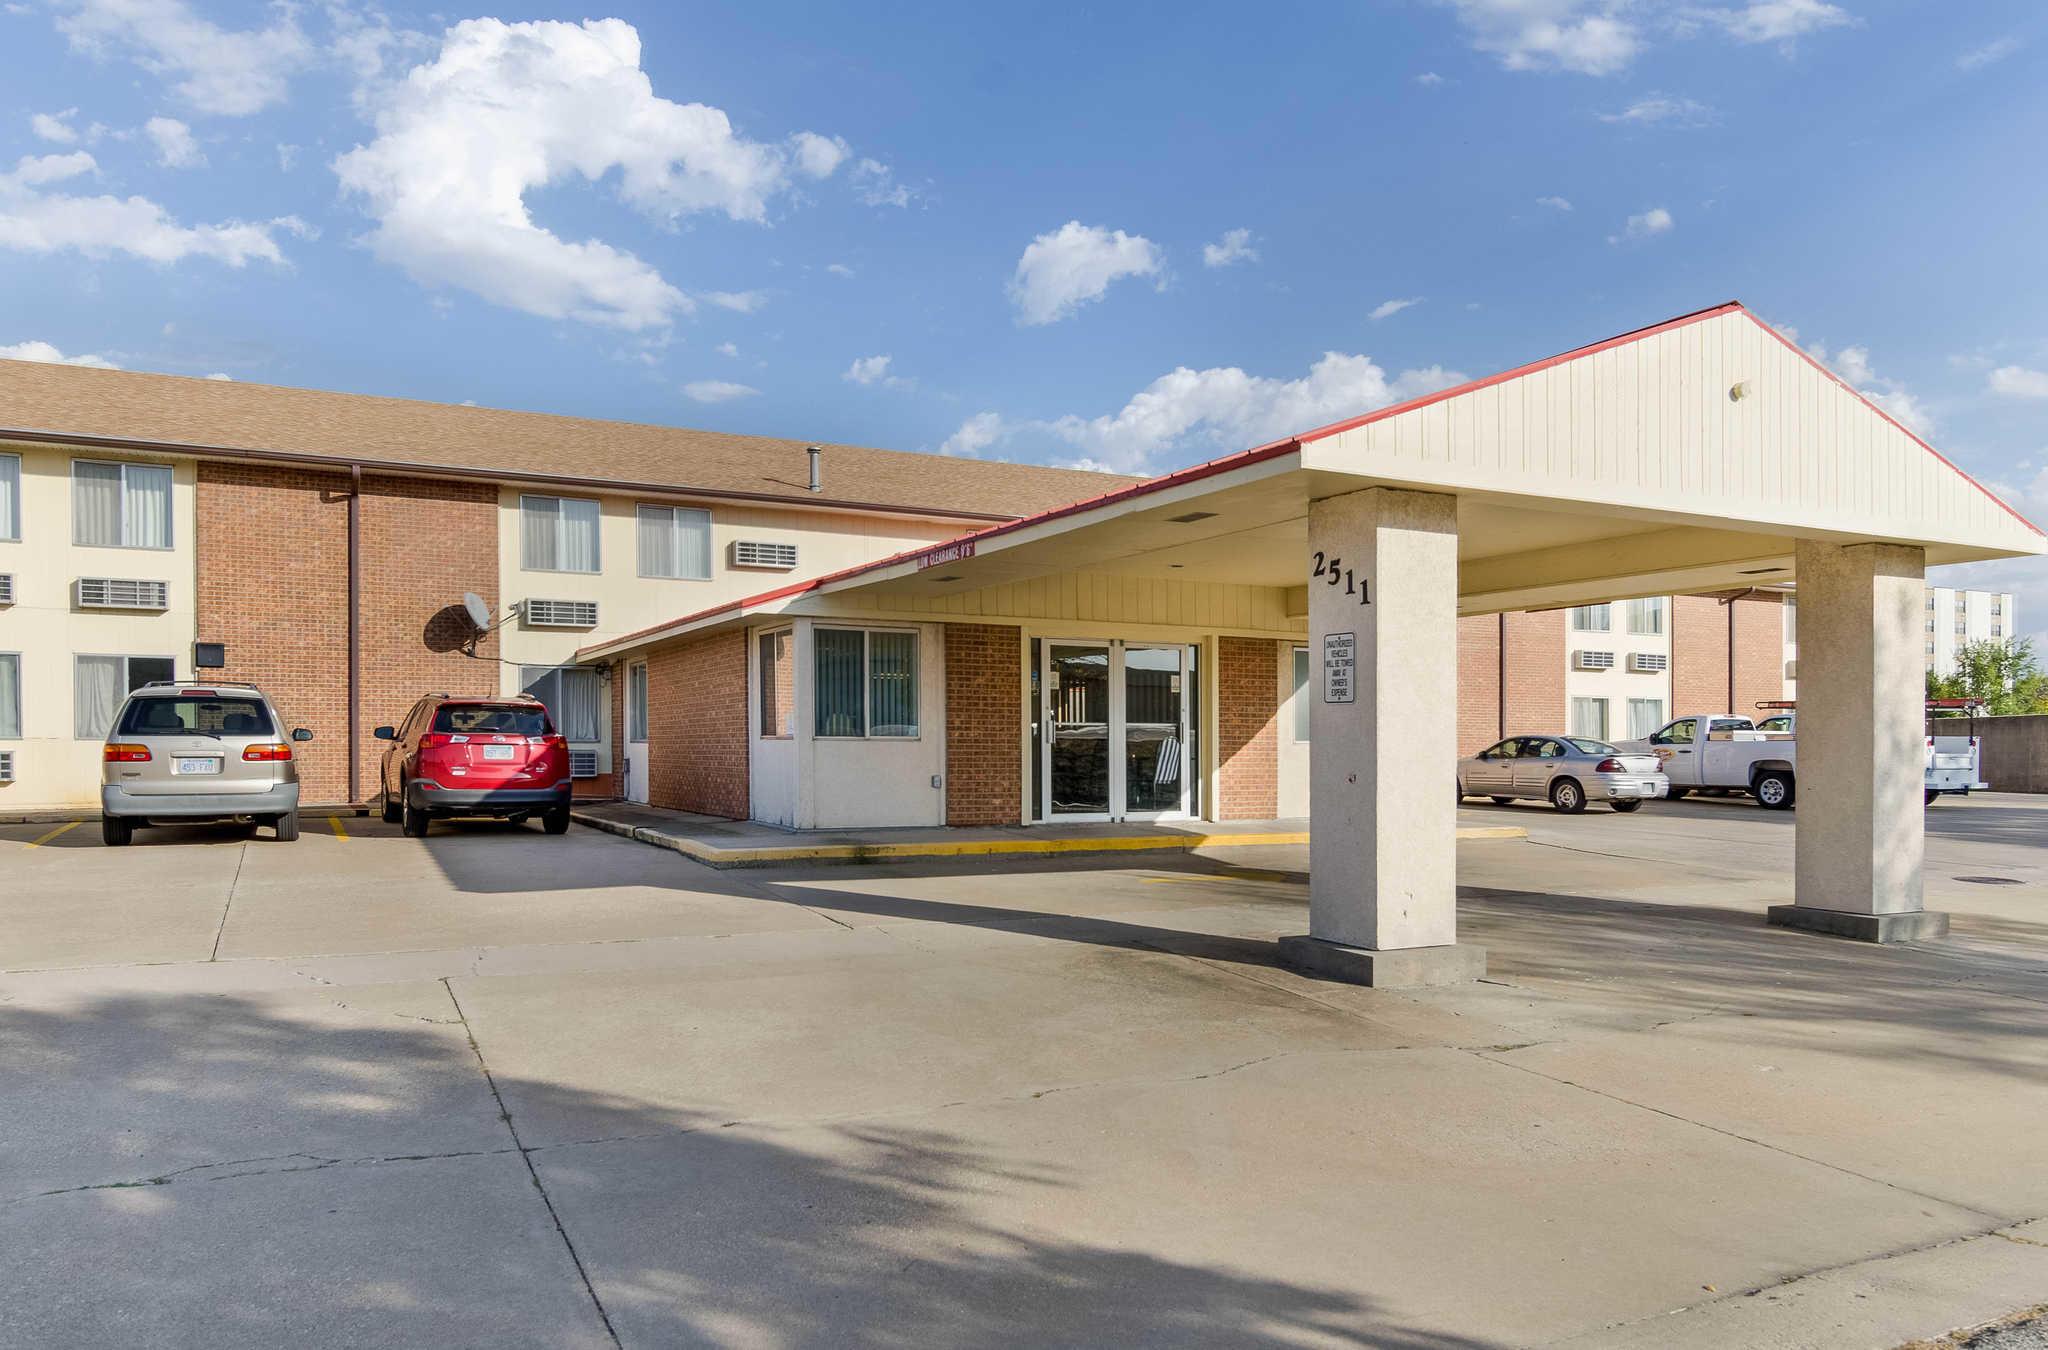 Americas Best Inn And Suites Emporia Business Listings In Emporia Ks United States